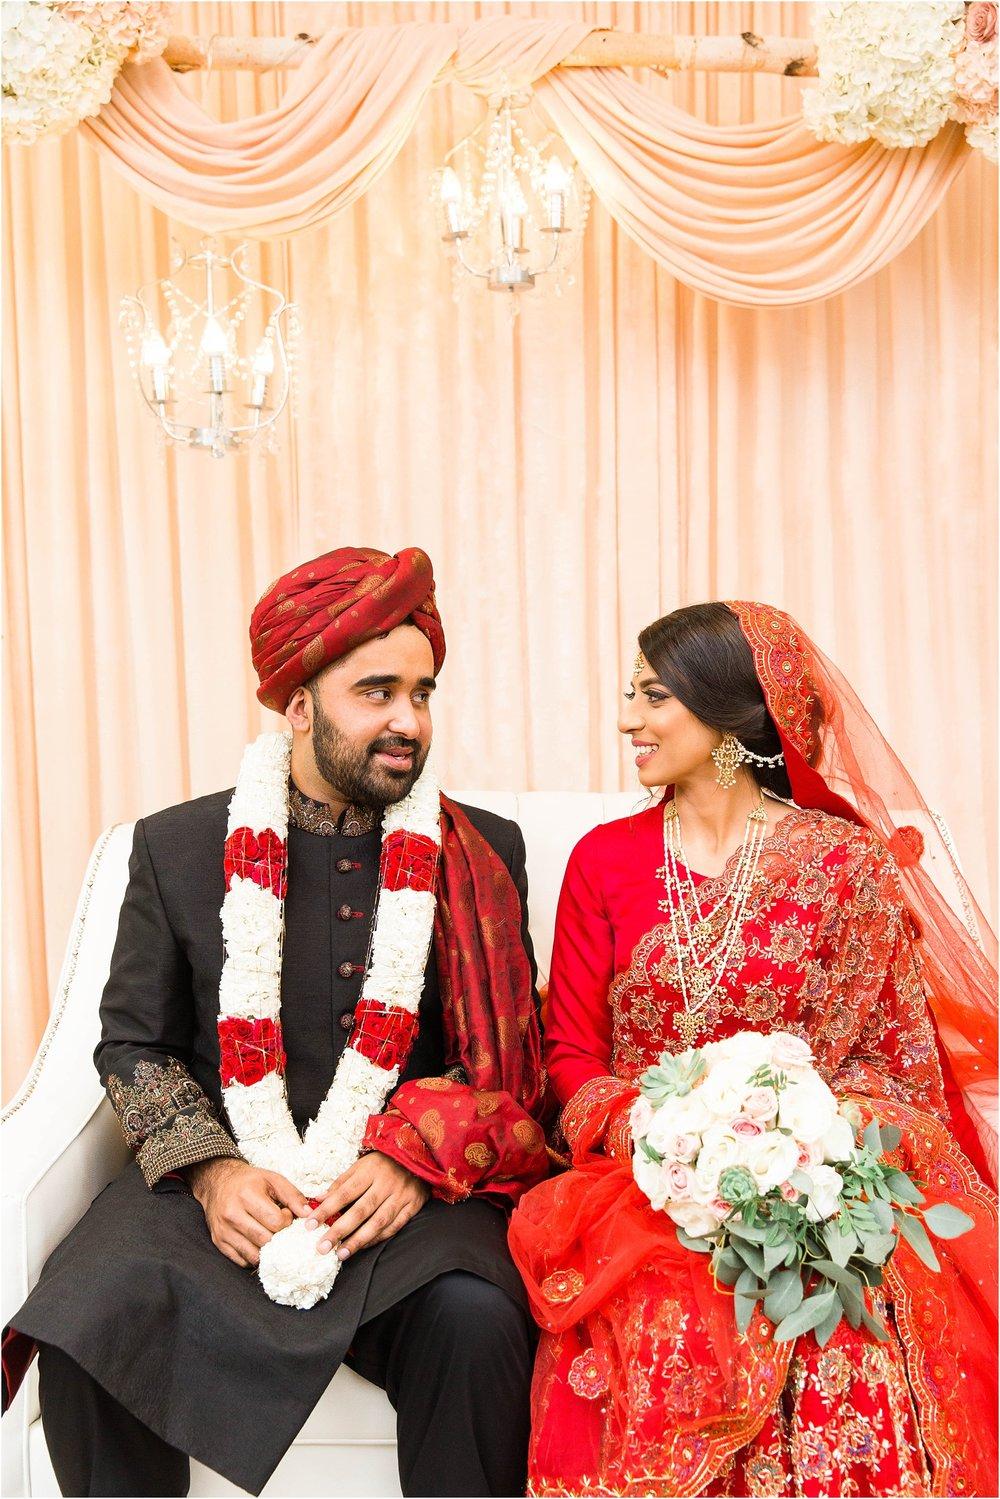 Jame-Masjid-Coopers-Mosque-Kariya-Park-Cherry-Blossoms-Wedding-Toronto-Mississauga-Brampton-Scarborough-GTA-Pakistani-Indian-Wedding-Engagement-Photographer-Photography_0040.jpg